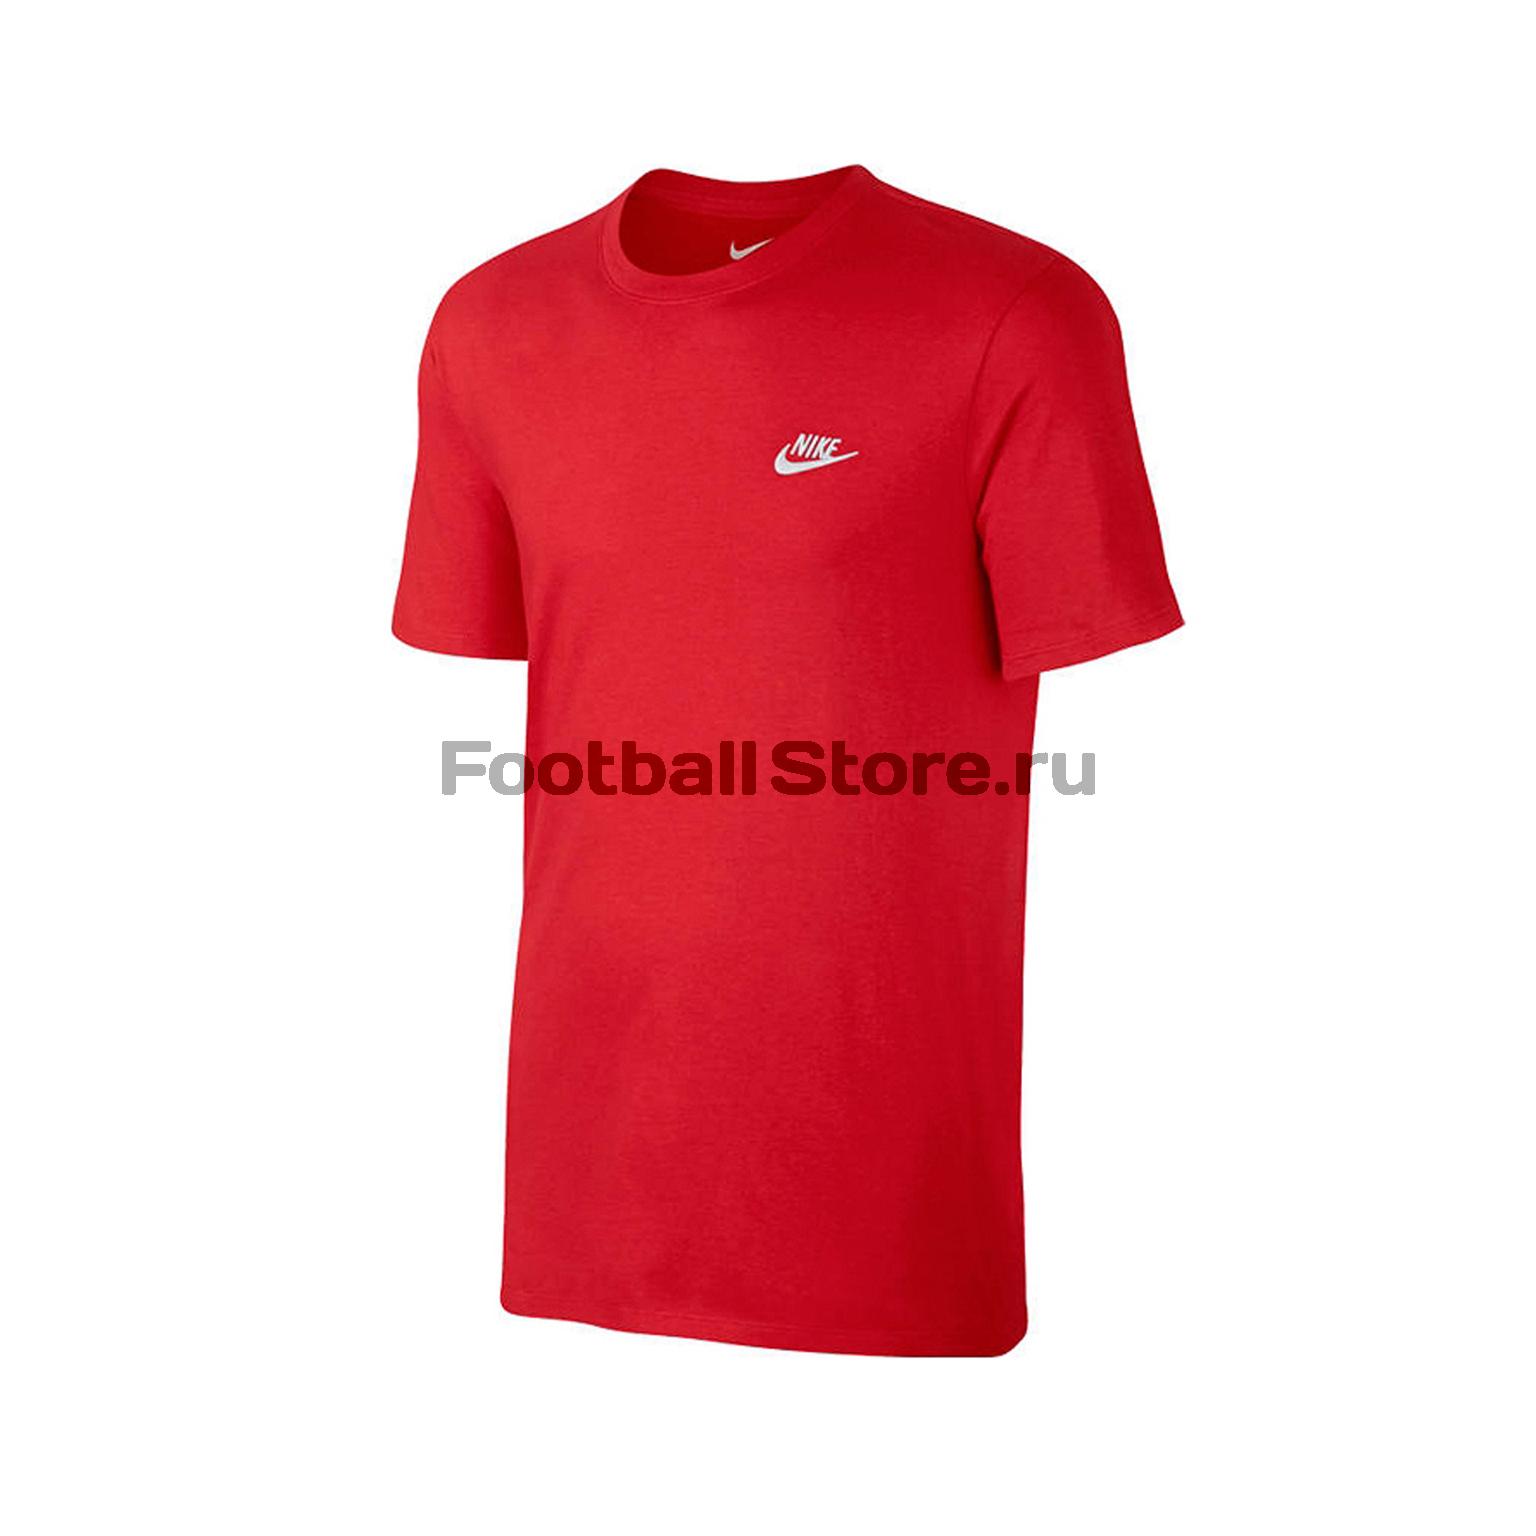 Футболка тренировочная Nike Tee Club Embrd Ftra 827021-659 футболки nike тренировочная футболка женская nike w nsw signal tee logo 821993 010